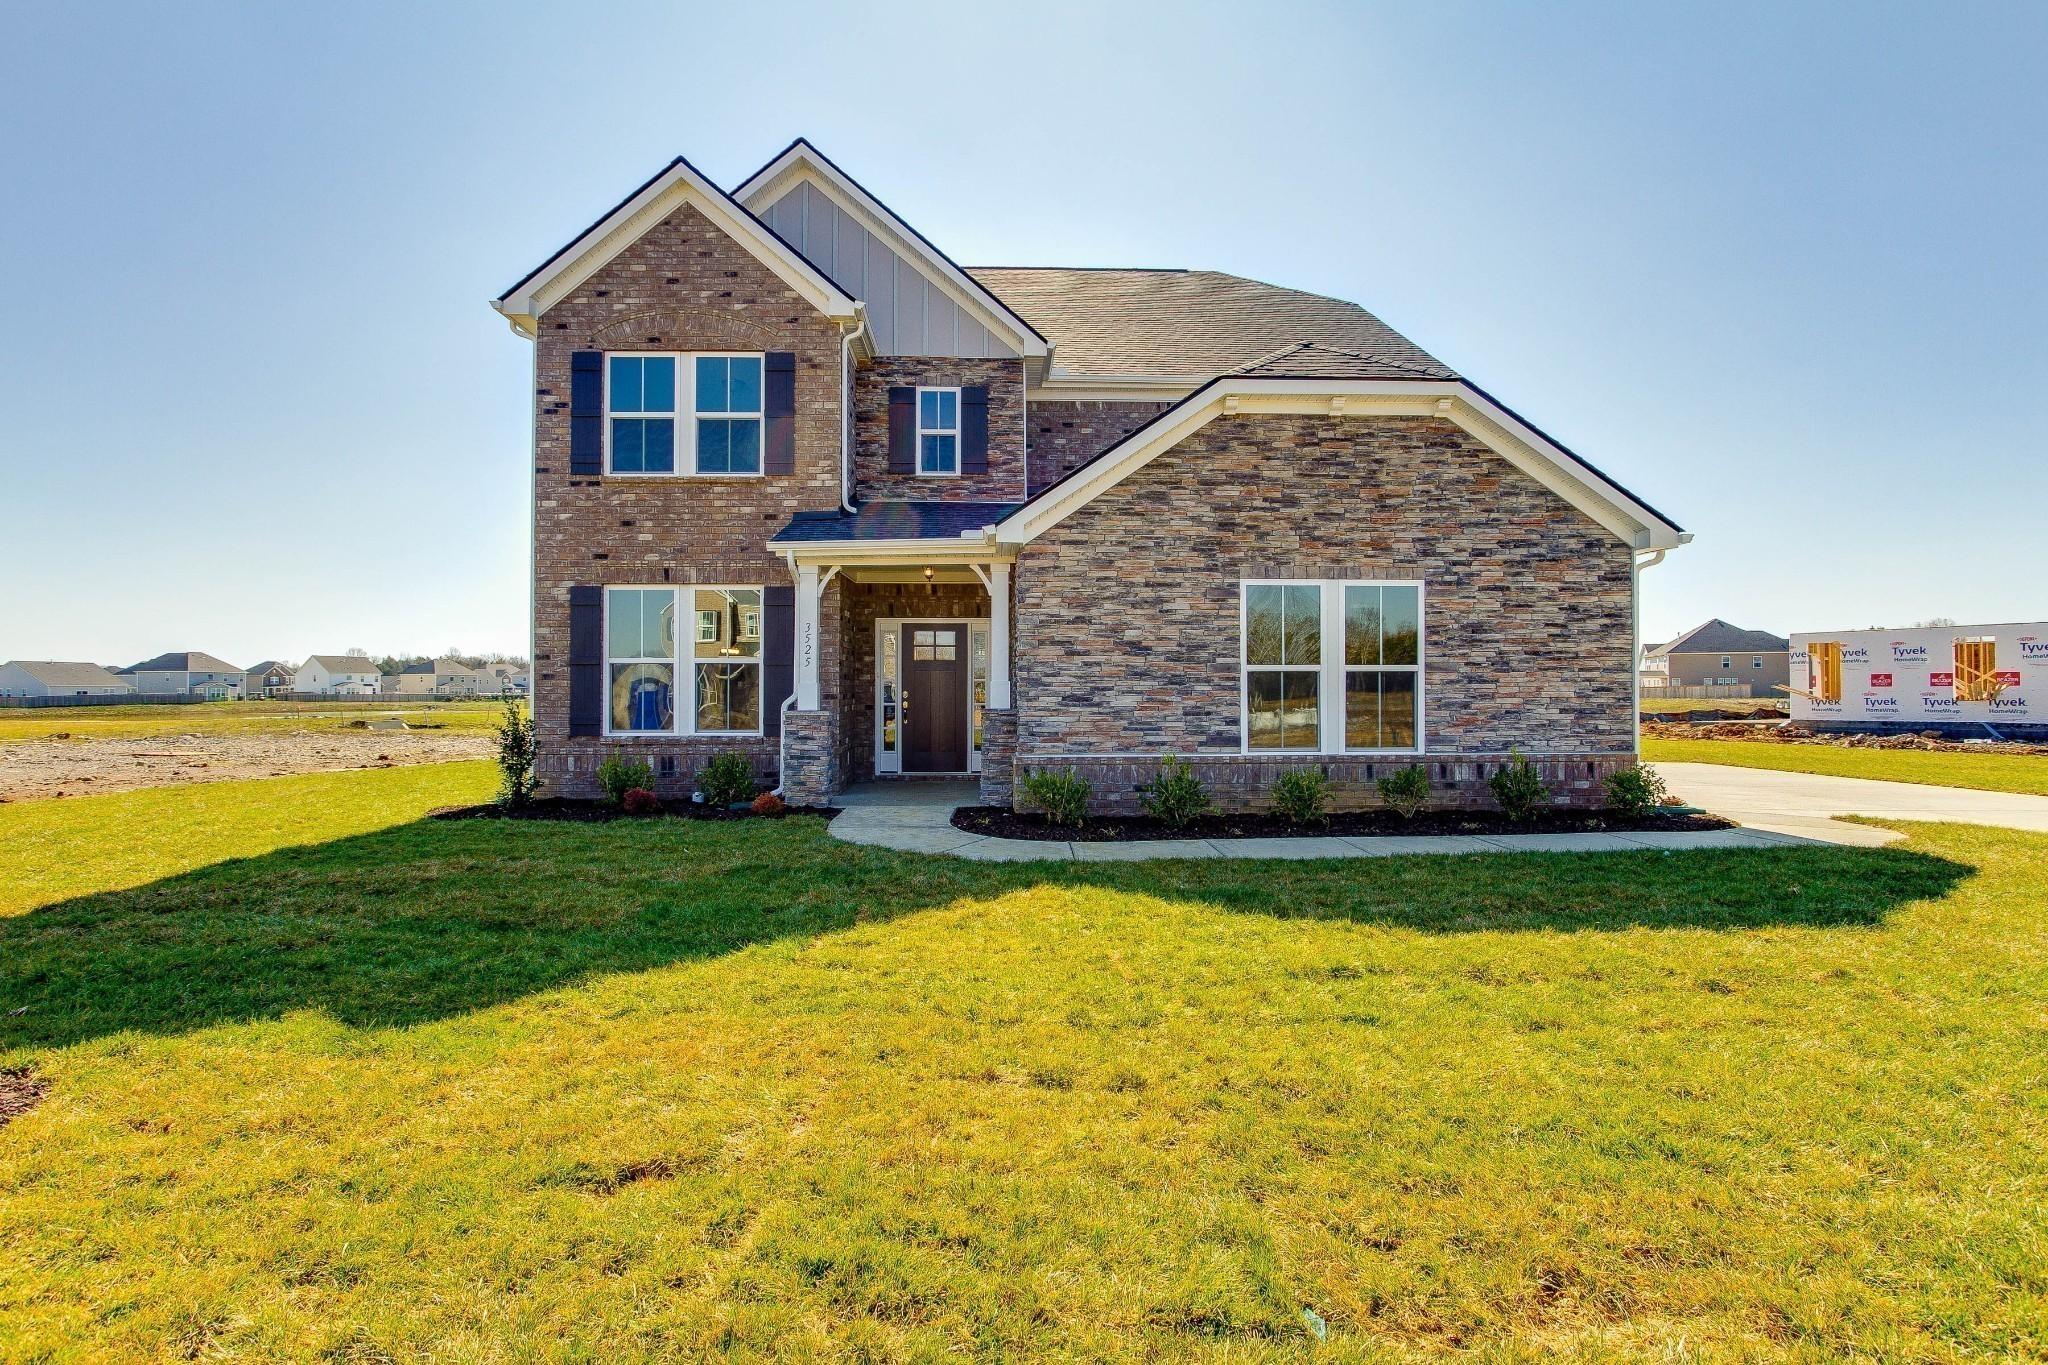 801 Old Blue Lane Property Photo - Murfreesboro, TN real estate listing